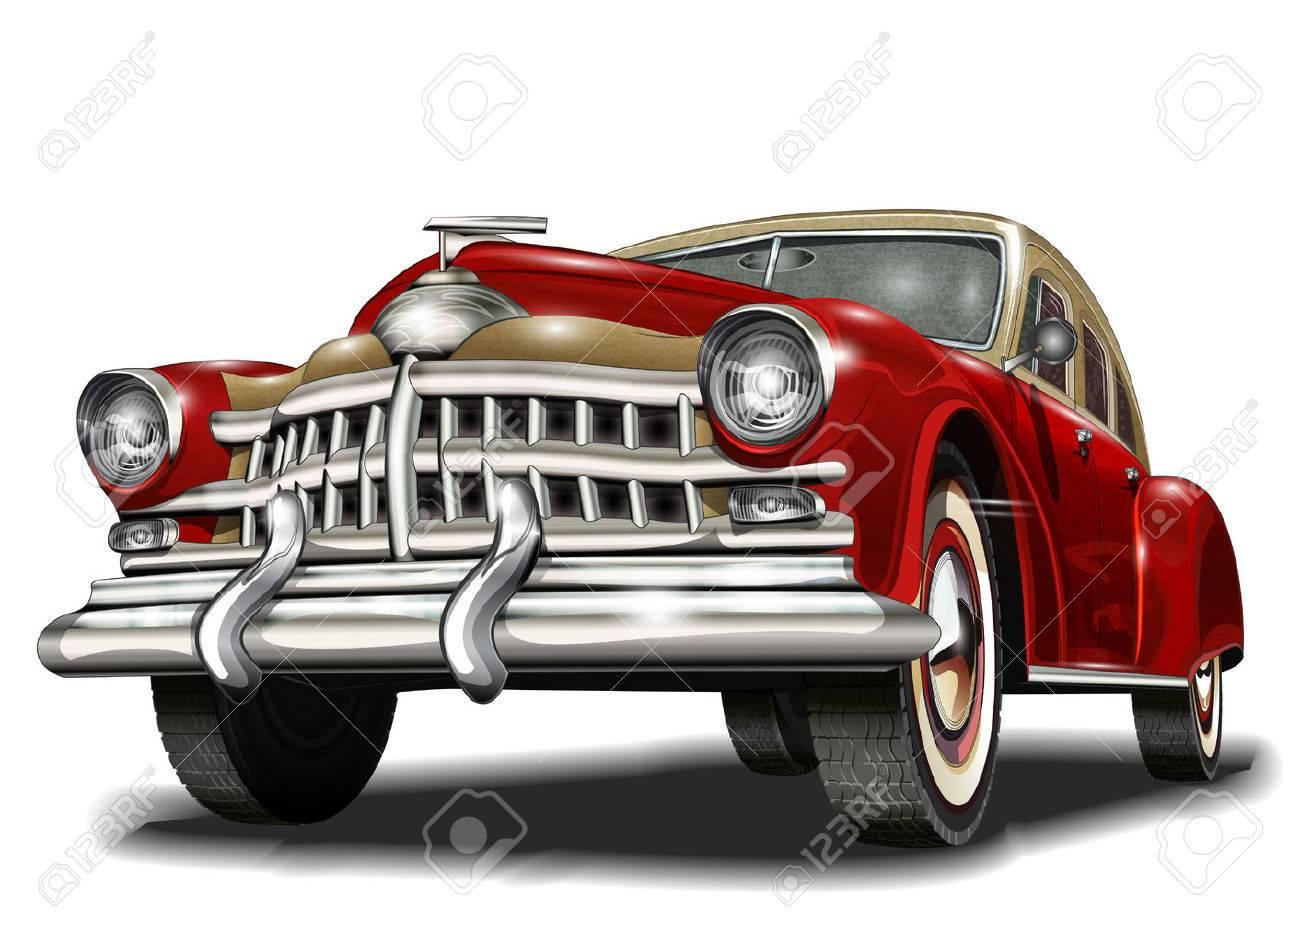 Retro car. - 50143106